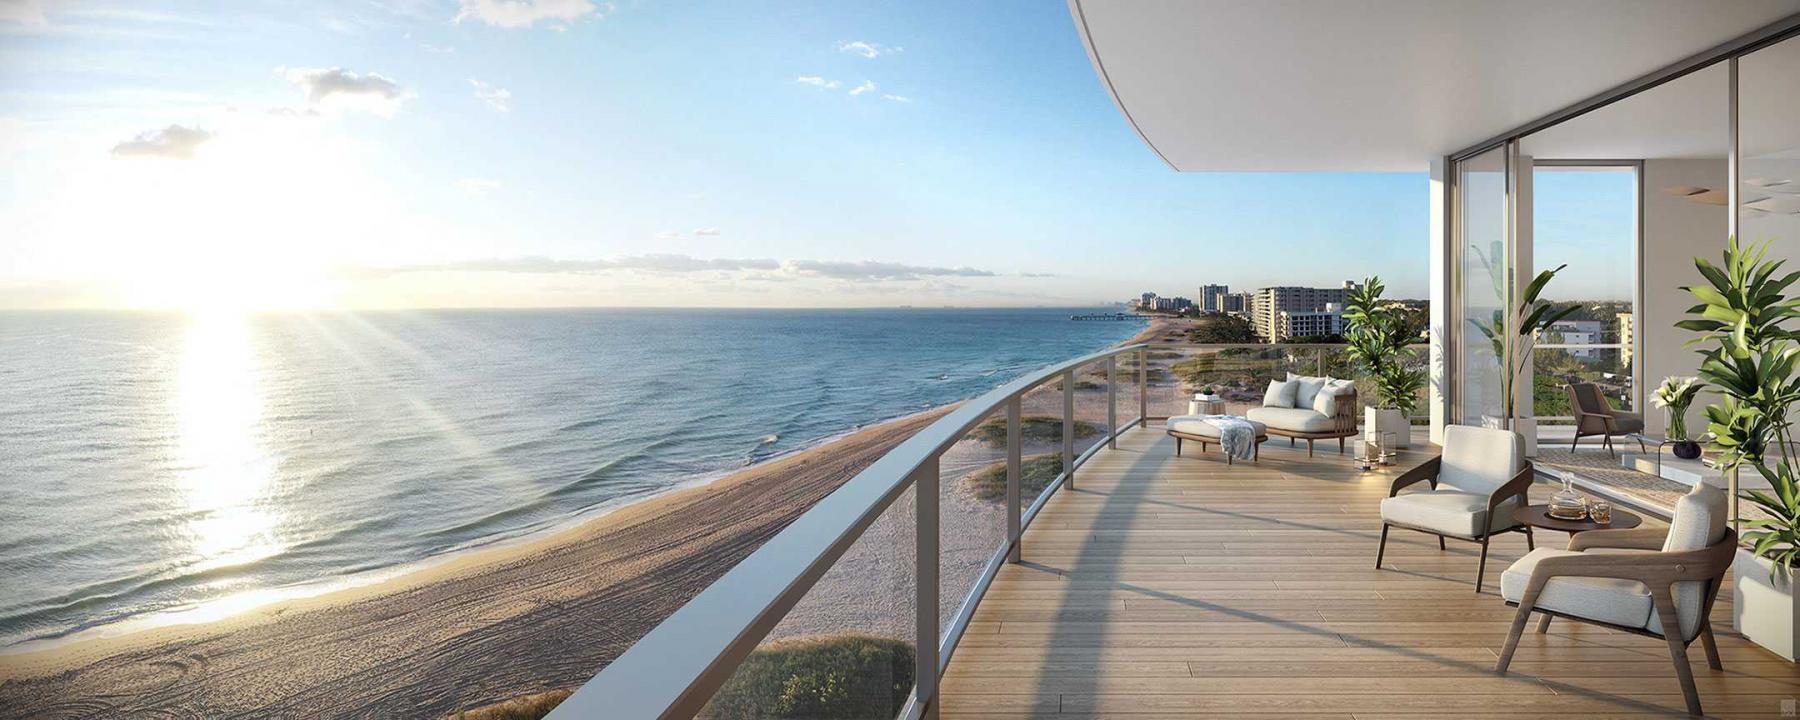 Solemar Pompano Beach - Квартиры на продажу